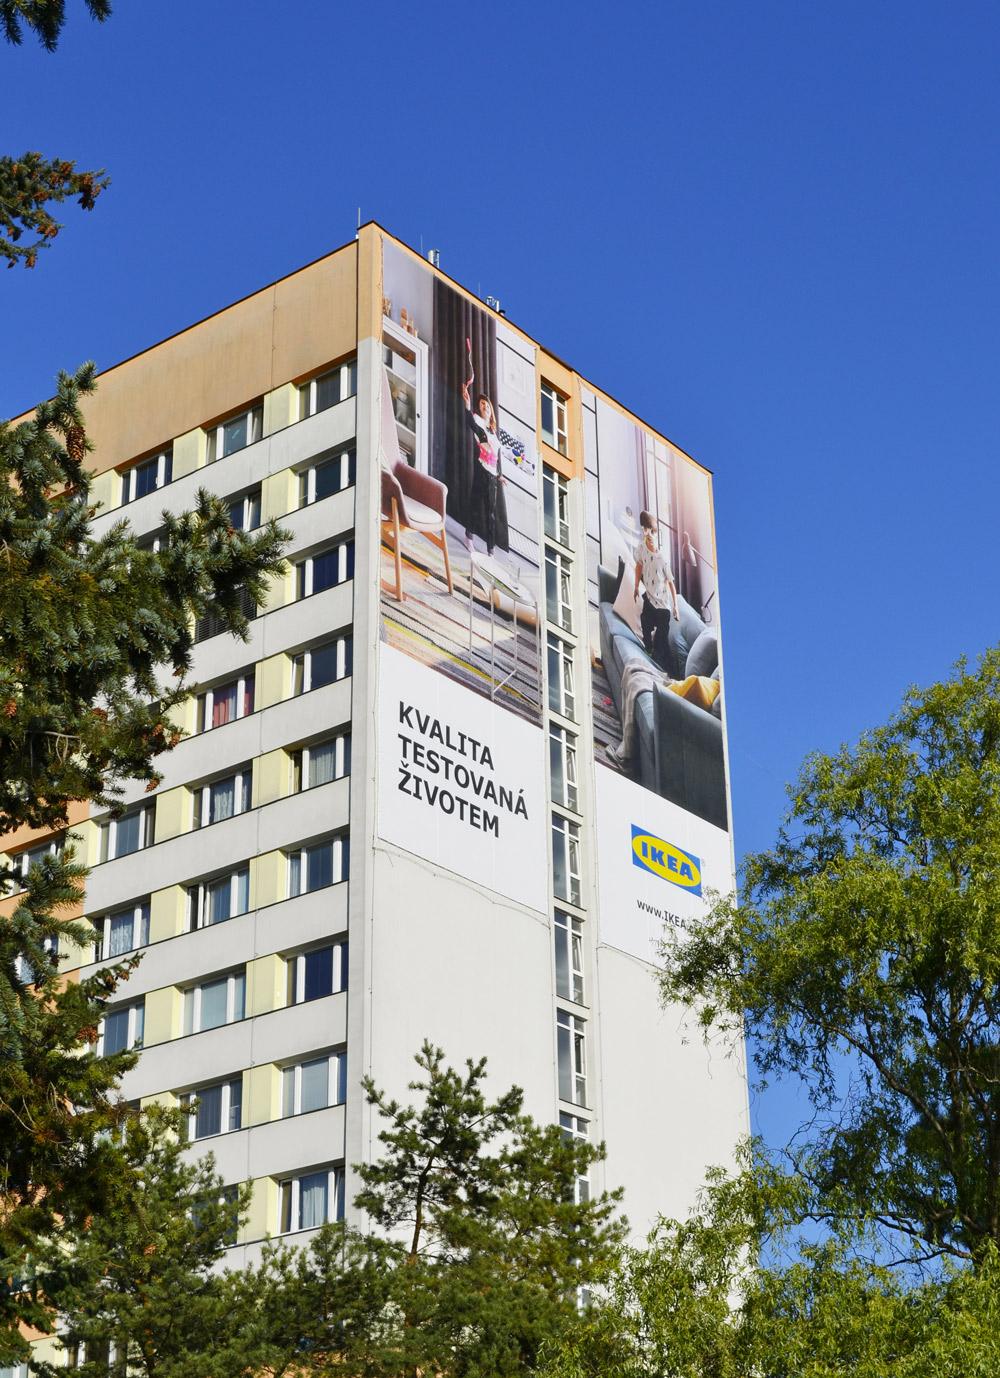 WEREK-MEDIA-Reklamni-plochy-Brno---038ZB-Halasovo-namesti---klient-IKEA---OOH-kampan-10-2018-(9)